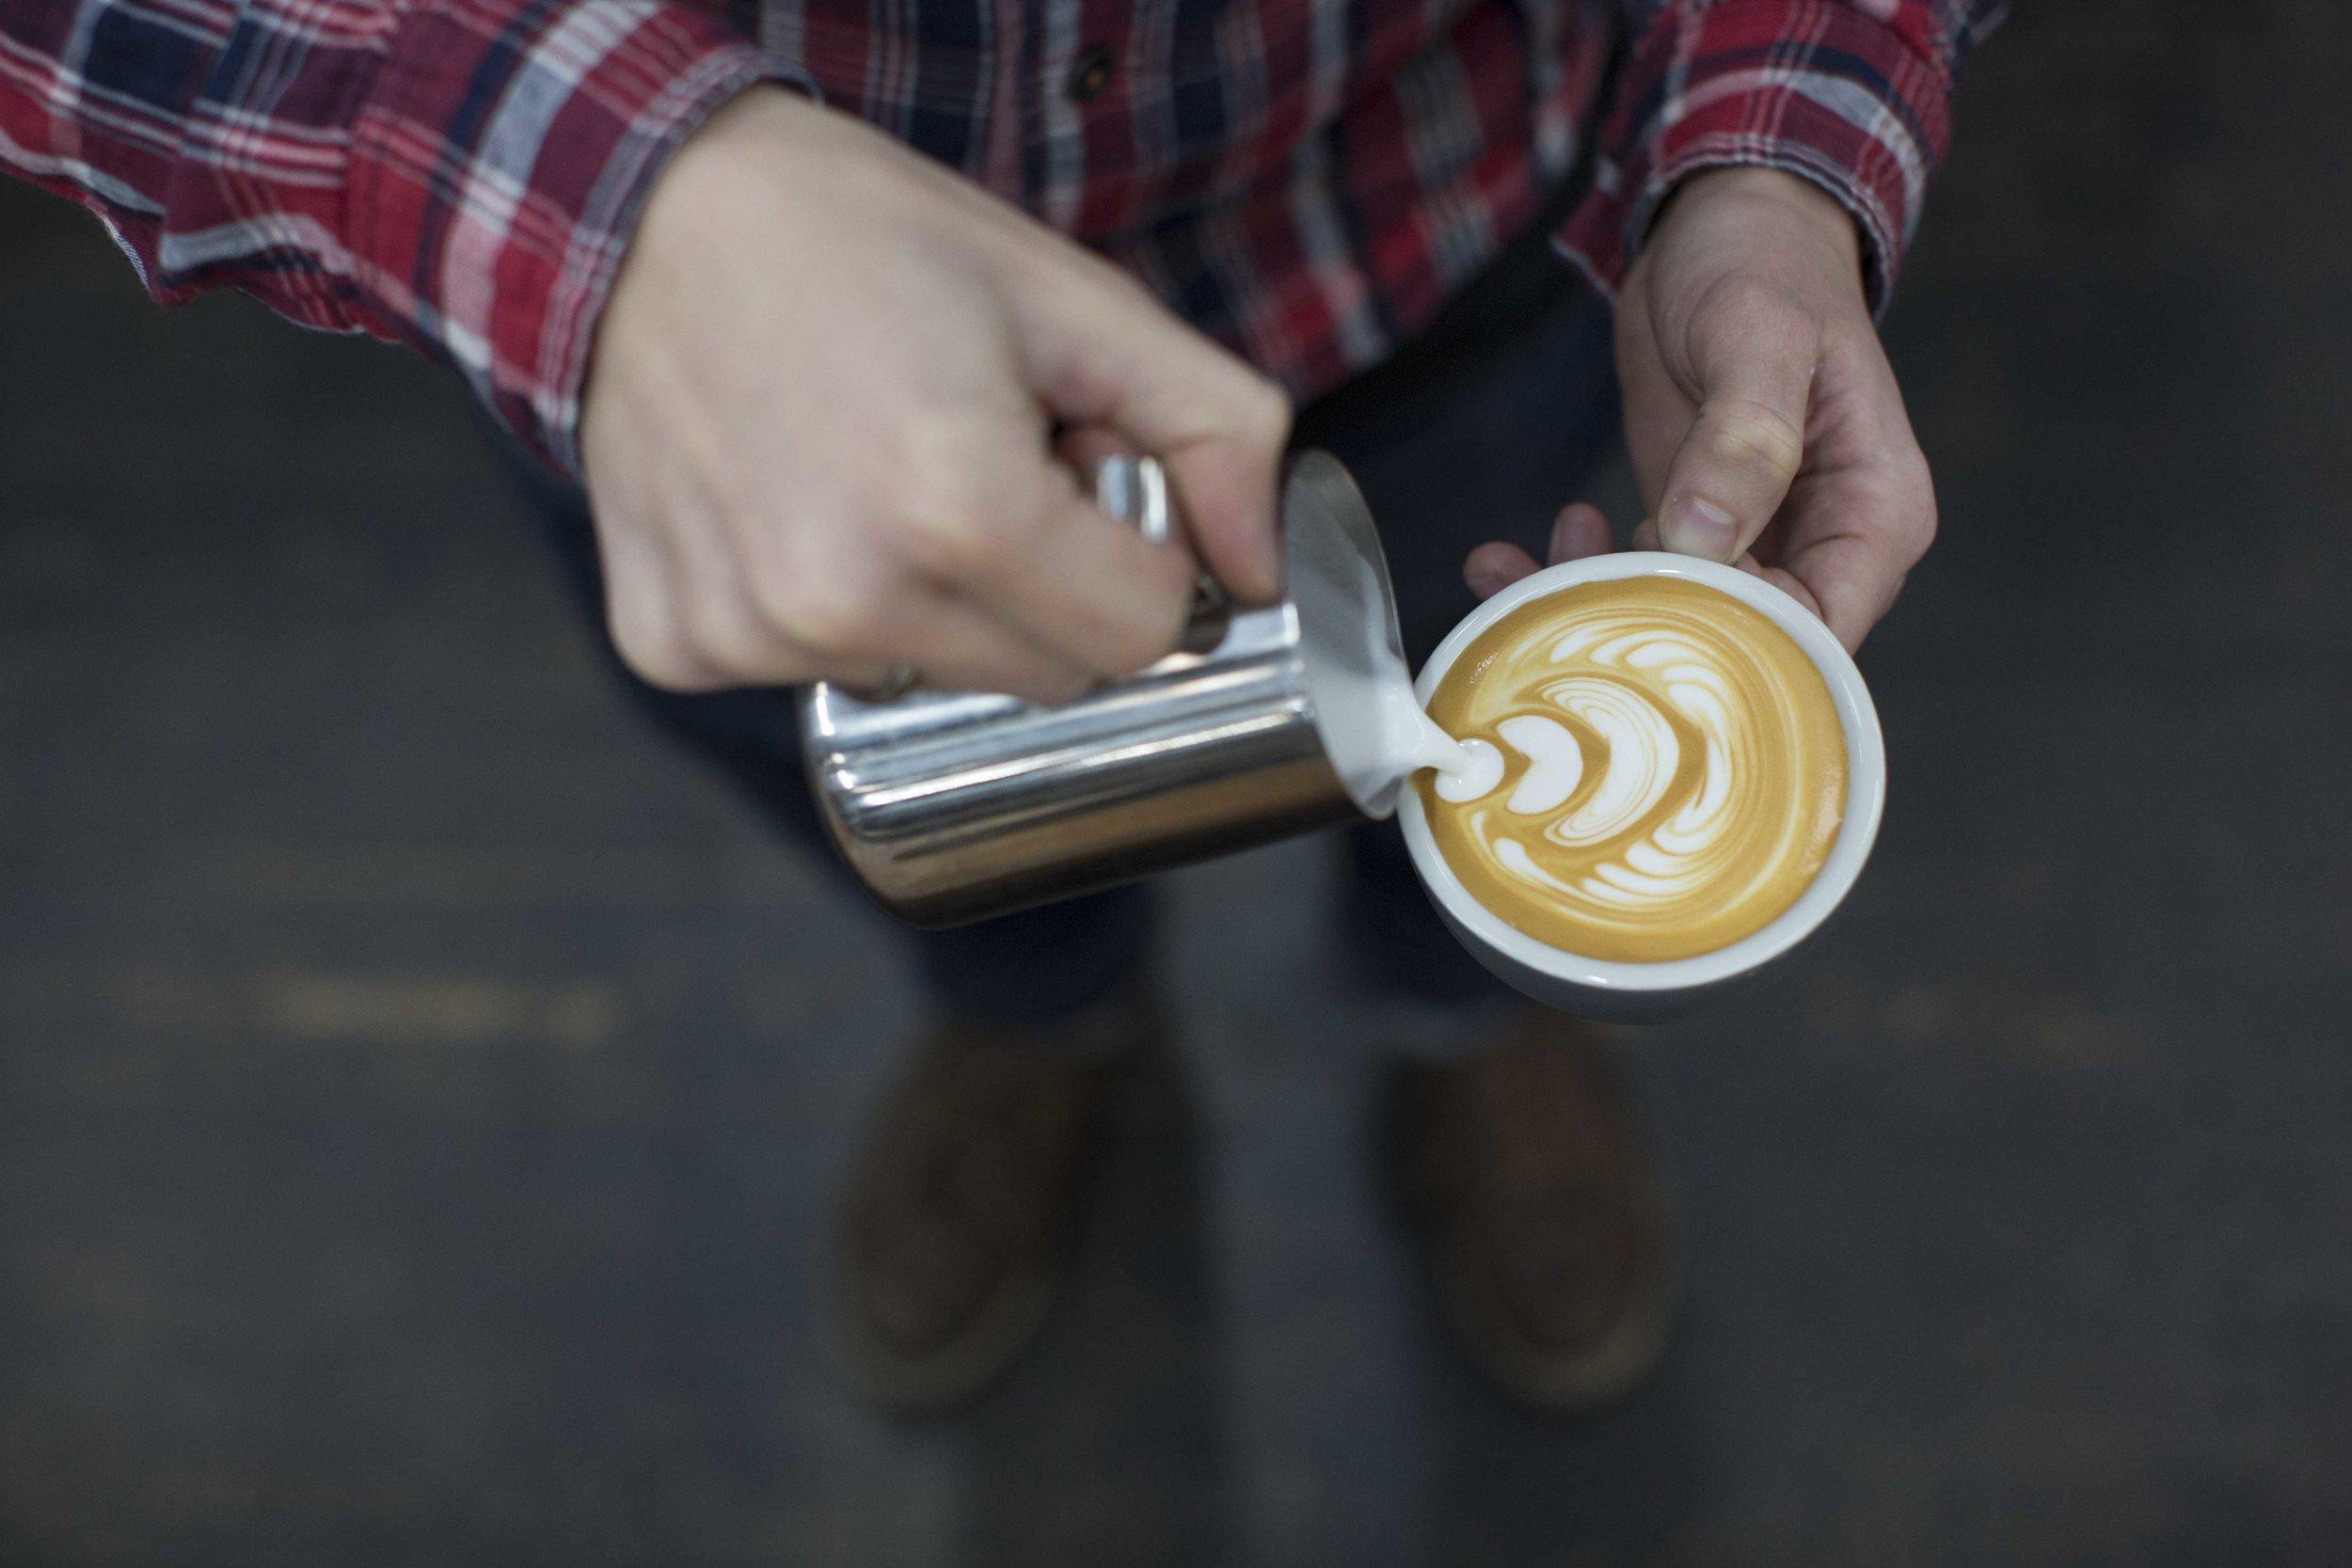 Extract-Latte-Art-Pour-2 (2).jpg